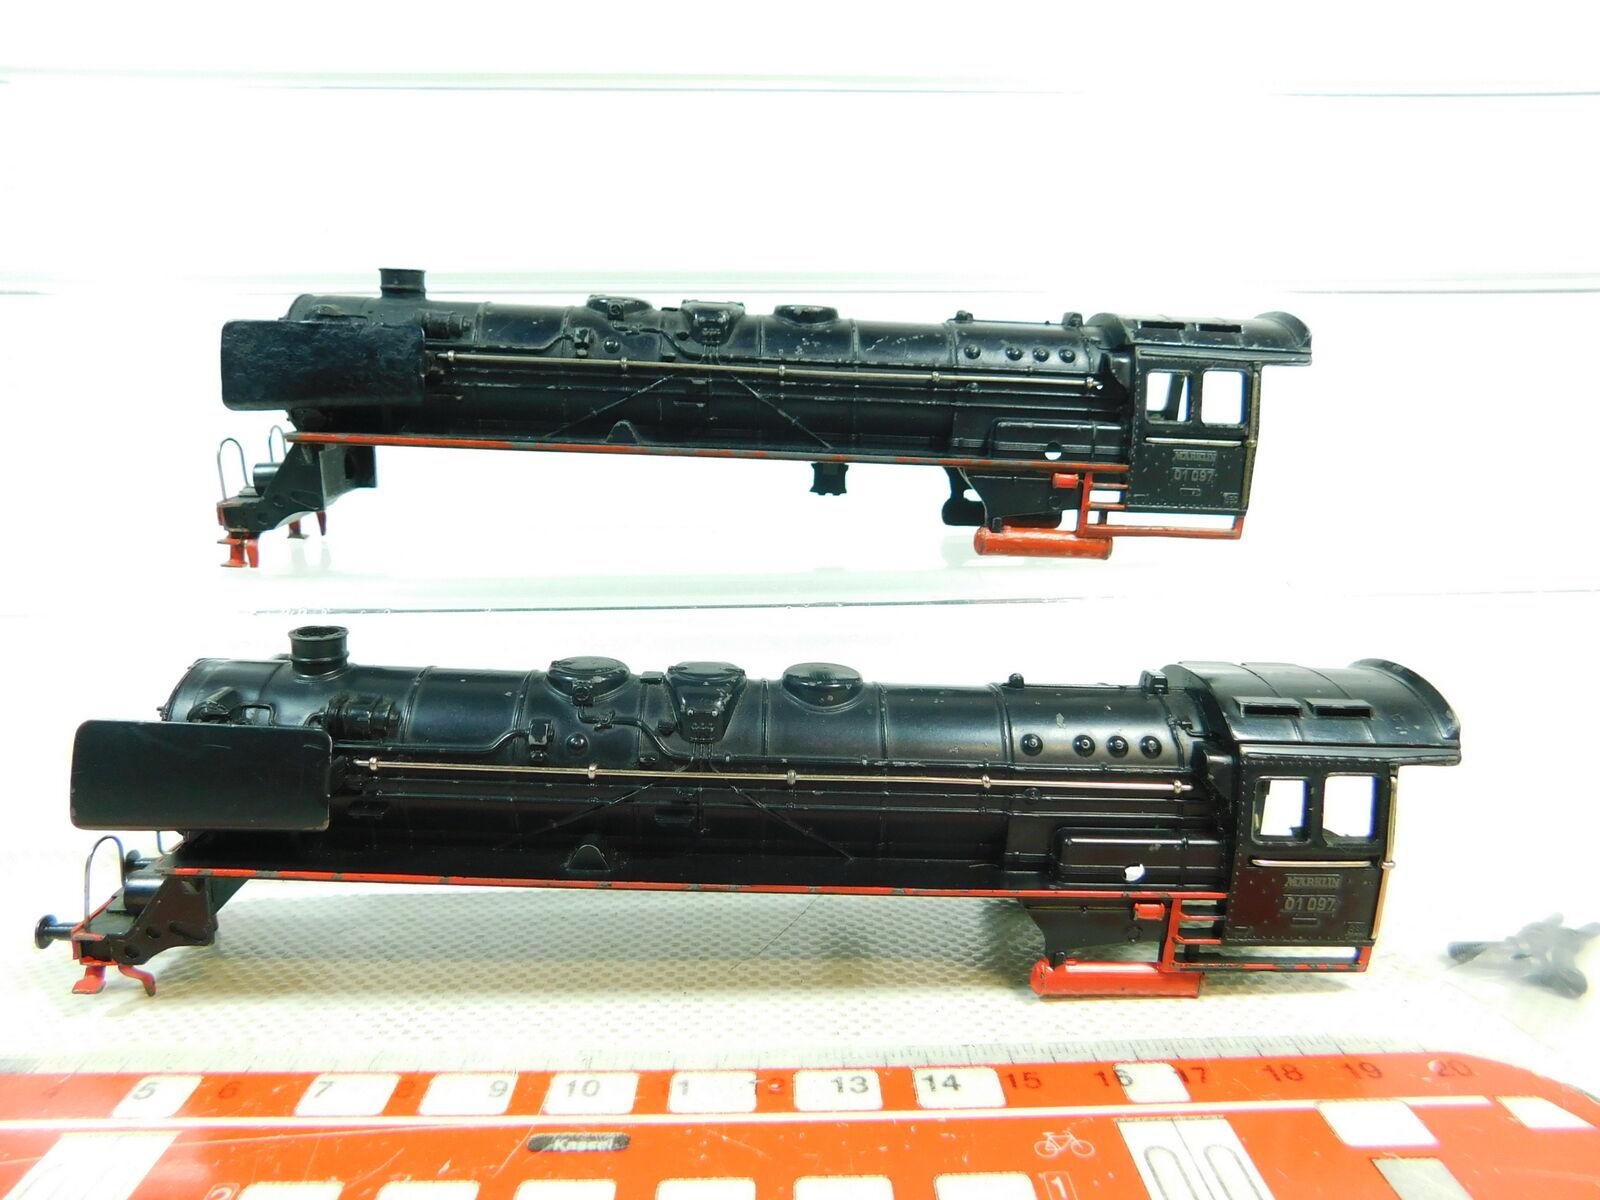 Bt297-1   2x Märklin h0 cast housing for F 800 Steam Locomotive 01 097, 2. Choice  magasin d'usine